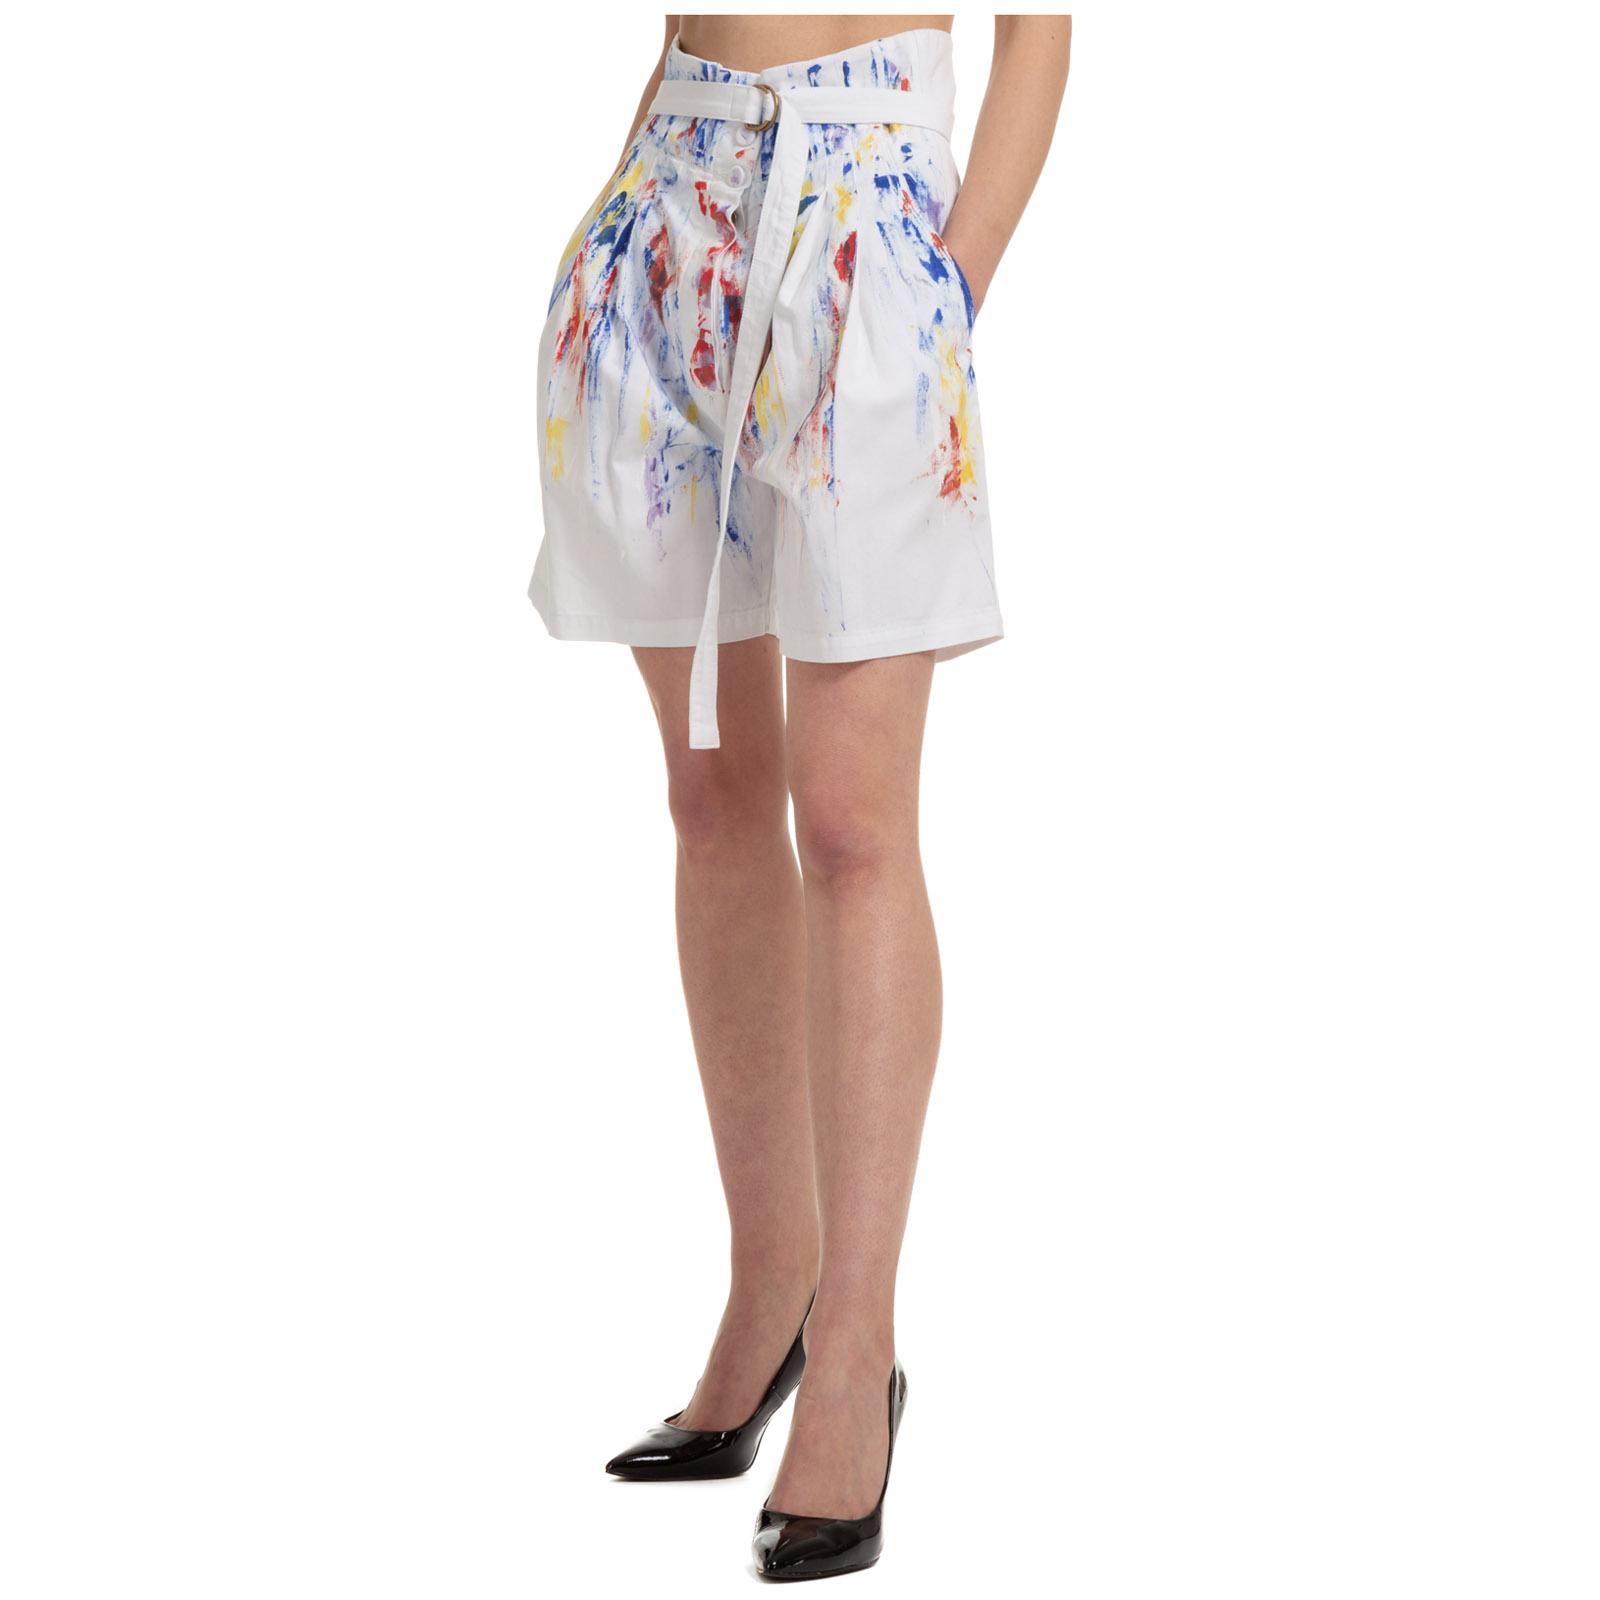 Pantaloncini corti shorts donna bermuda paintings